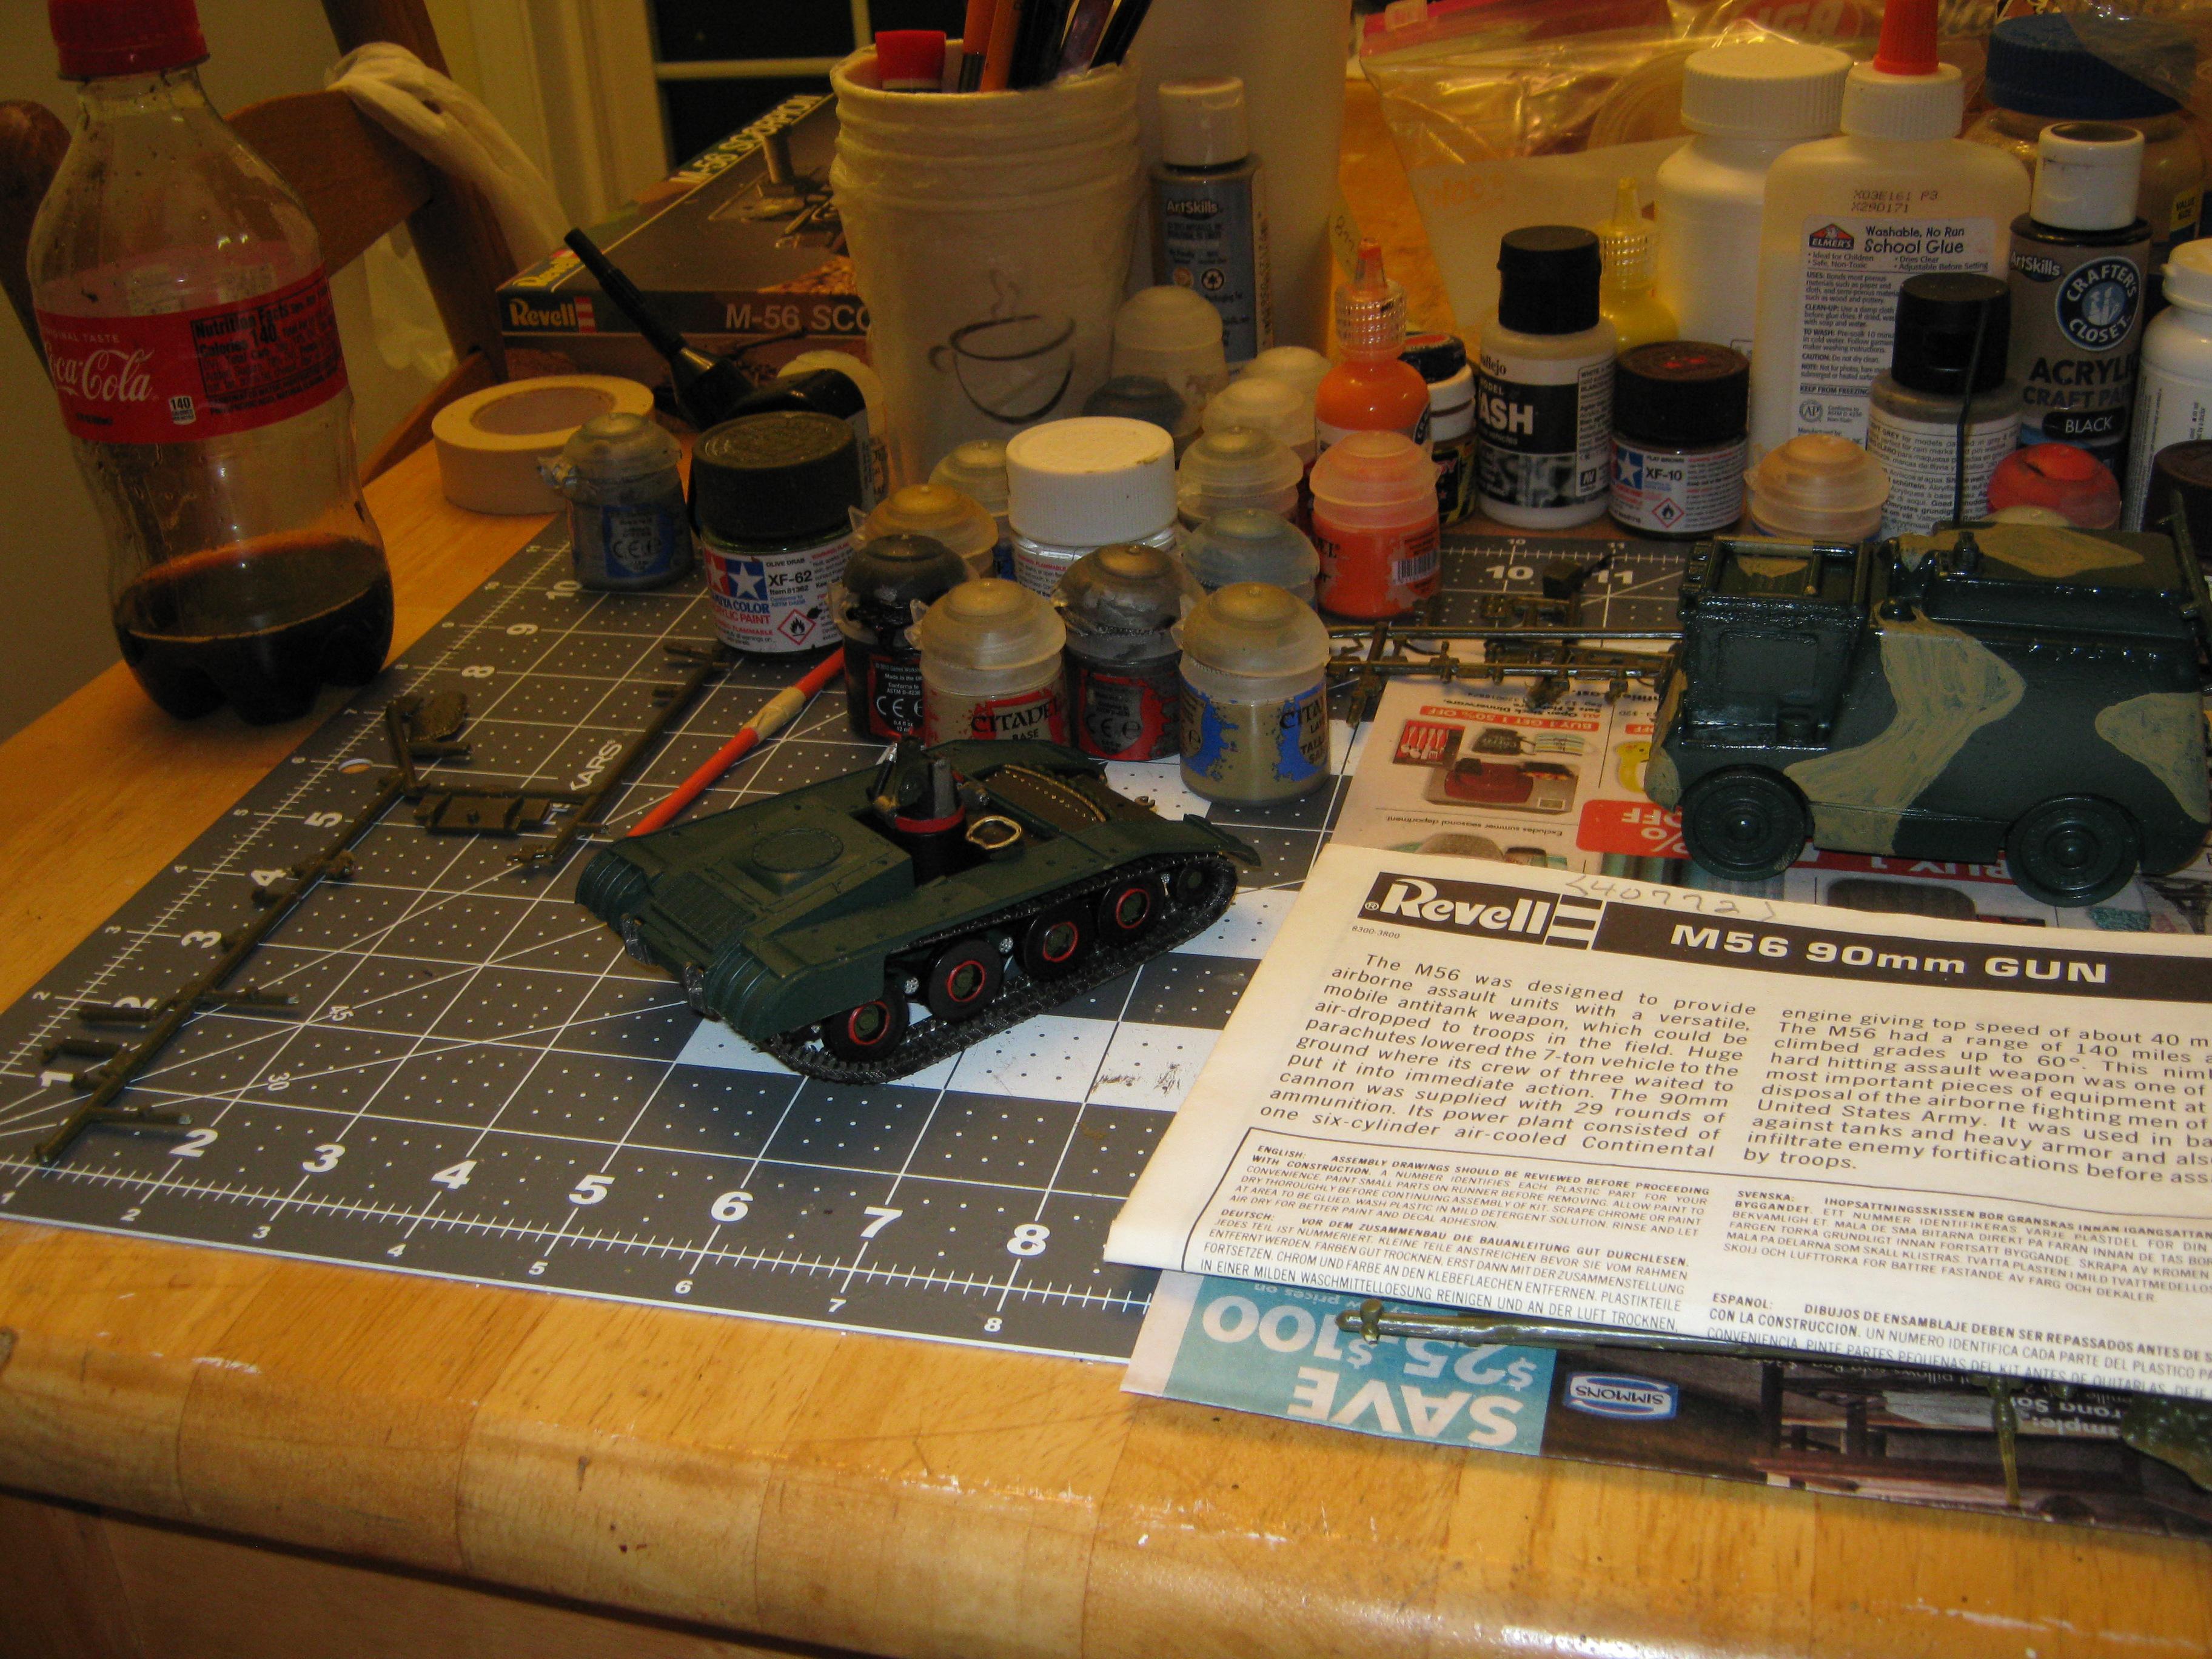 Airborne Vehicle, Anti-tank Gun, Cold War, Conversion, Counts As, Fire Support Vehicle, Fsv, Imperial, Light Tank, M56, Scorpion, Self Propelled Gun, Spg, Tank Destroyer, Vietnam